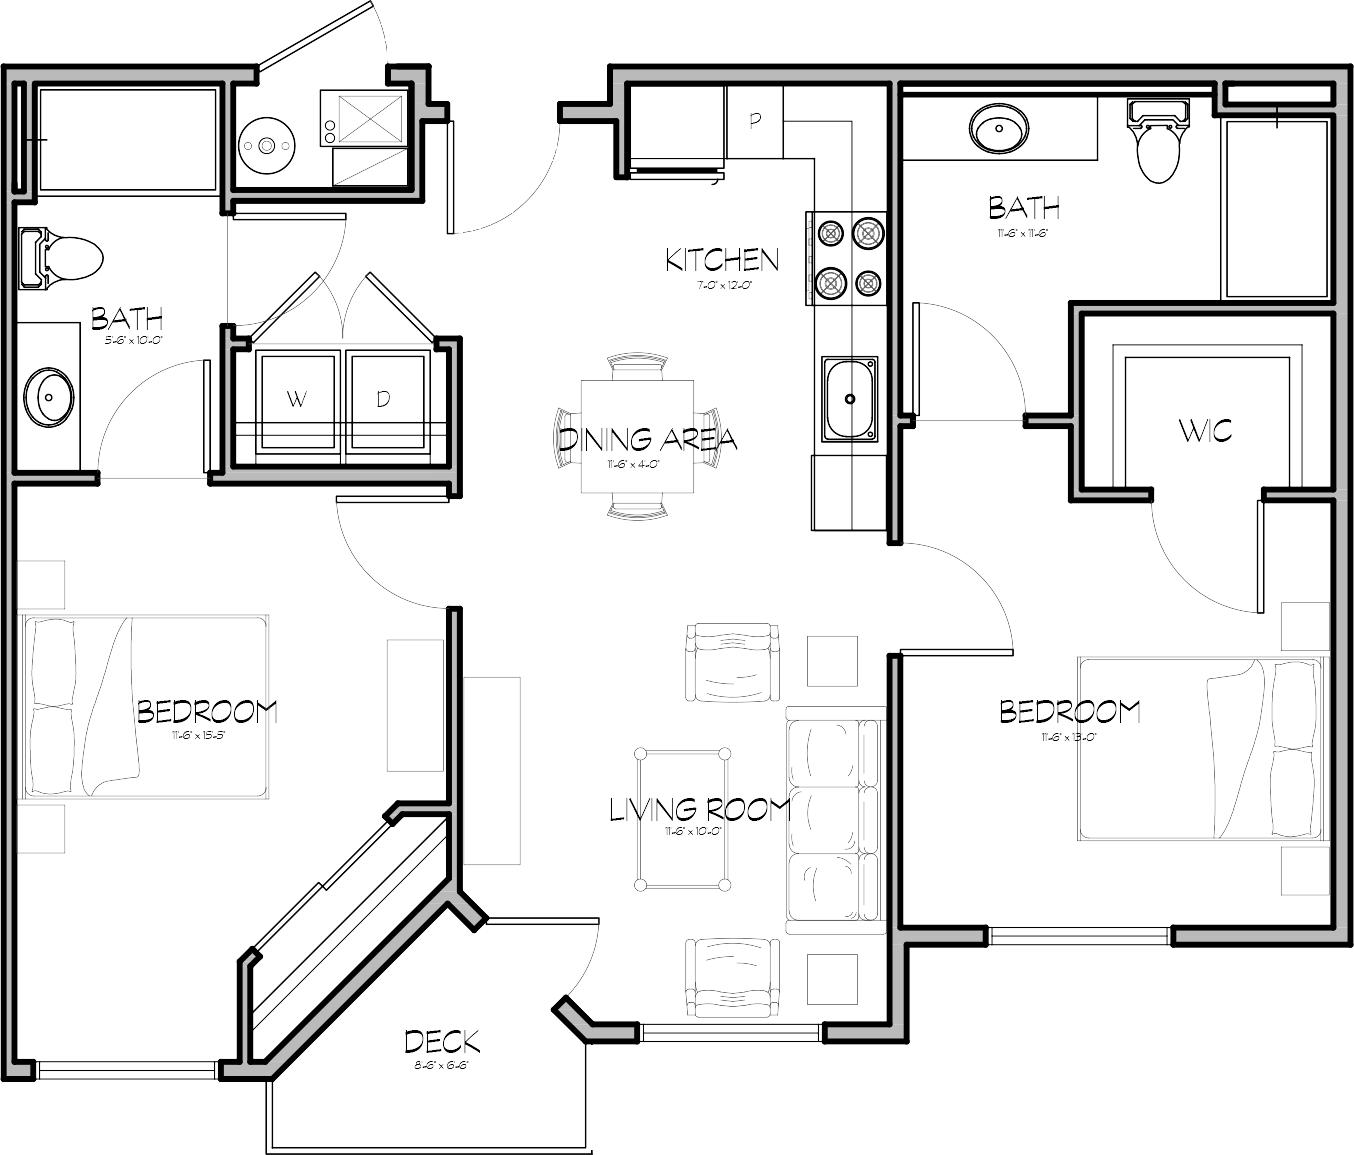 Parleys Floorplan 2 Bed 2 Bath North Temple Flats